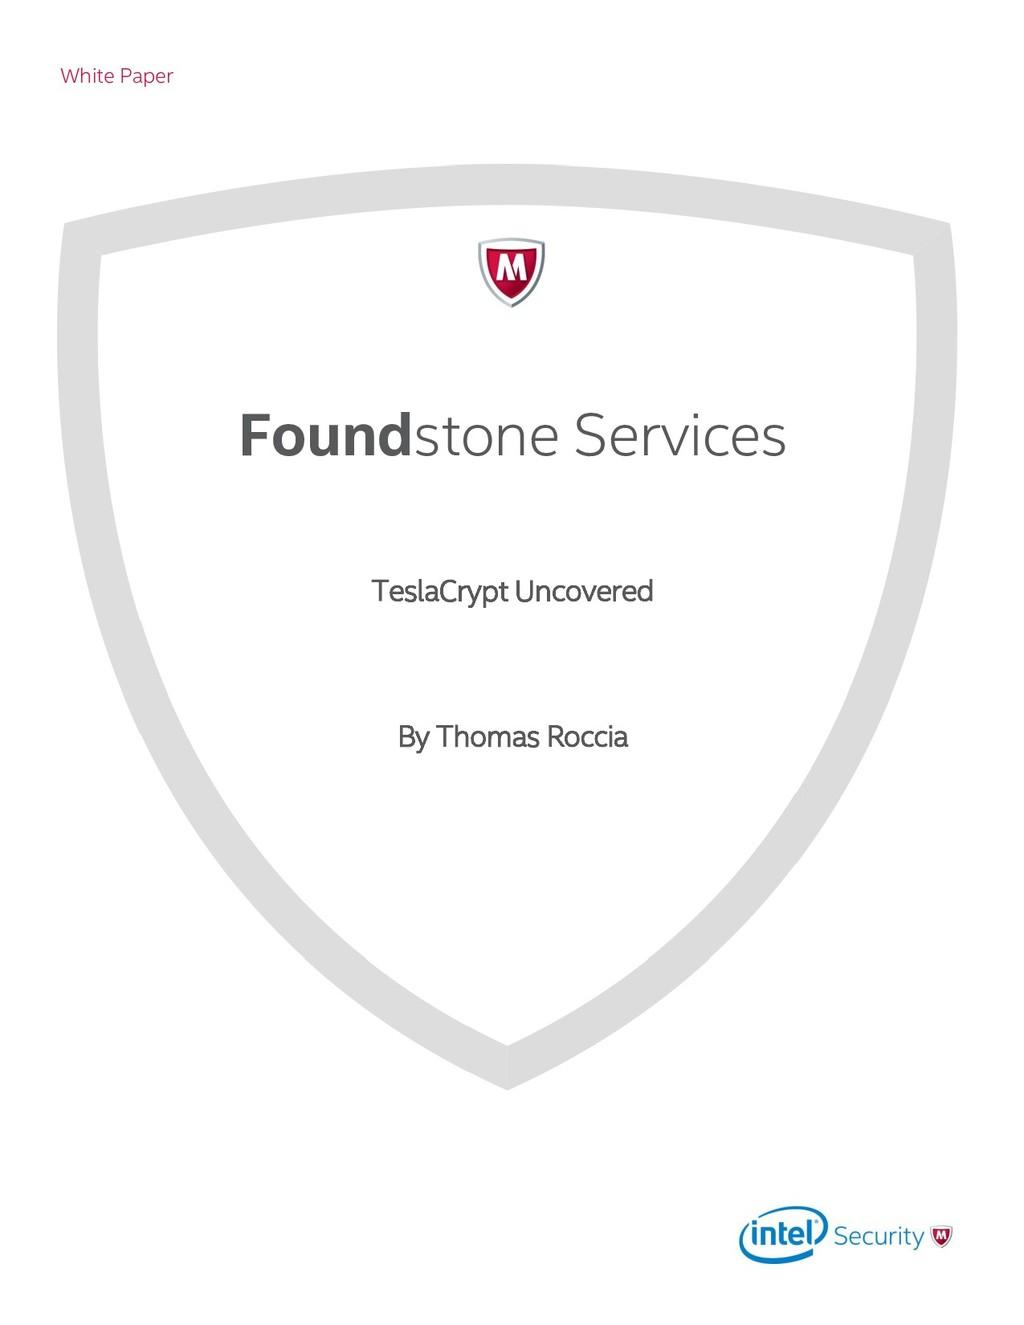 White Paper Foundstone Services TeslaCrypt Unco...